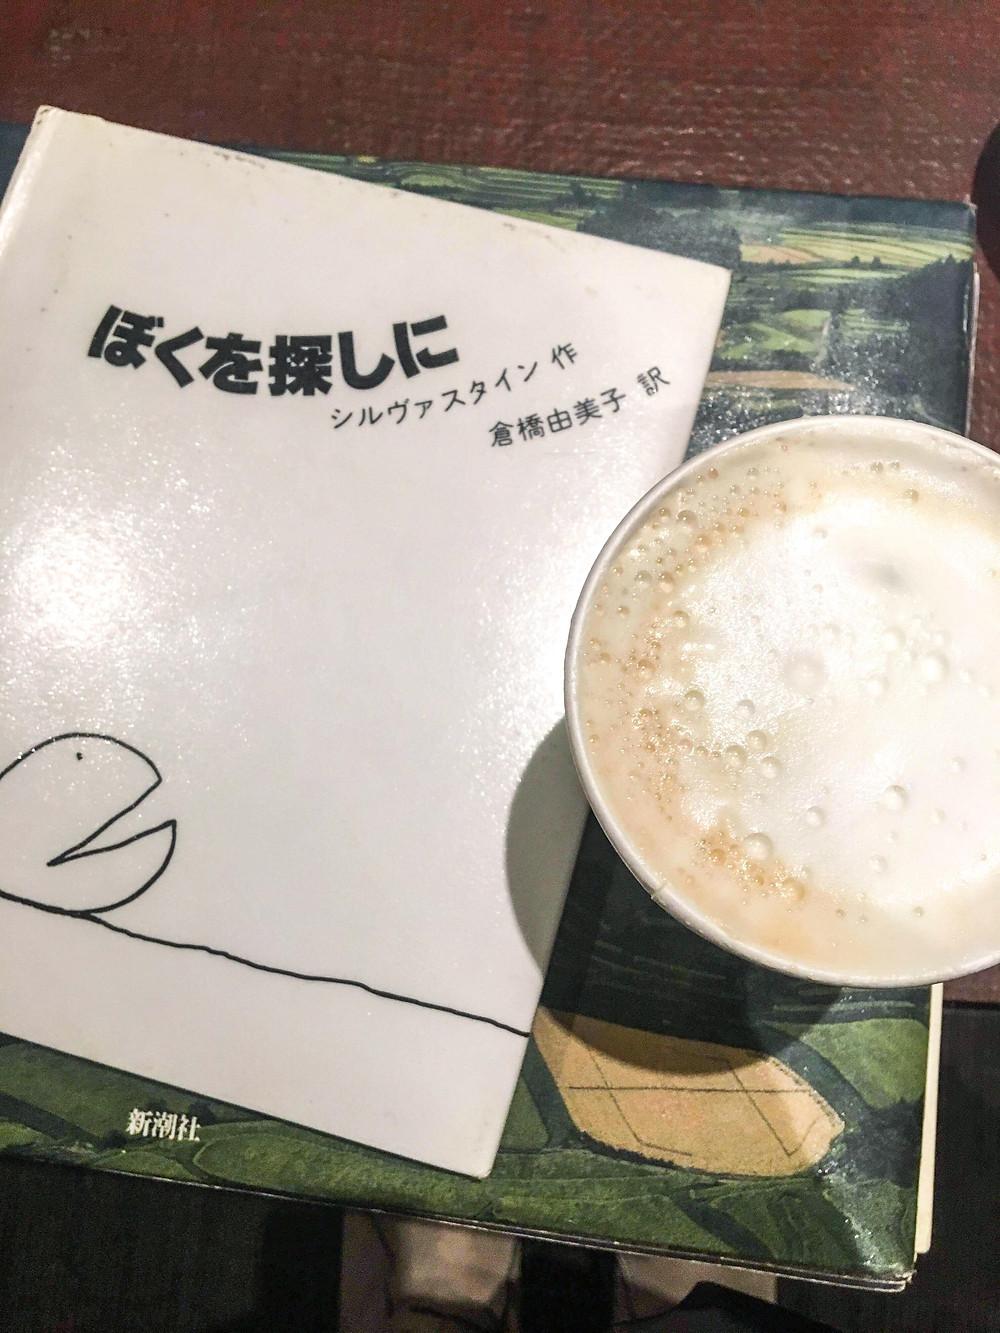 Vanlifejapan,The Missing Piece, Starbucks